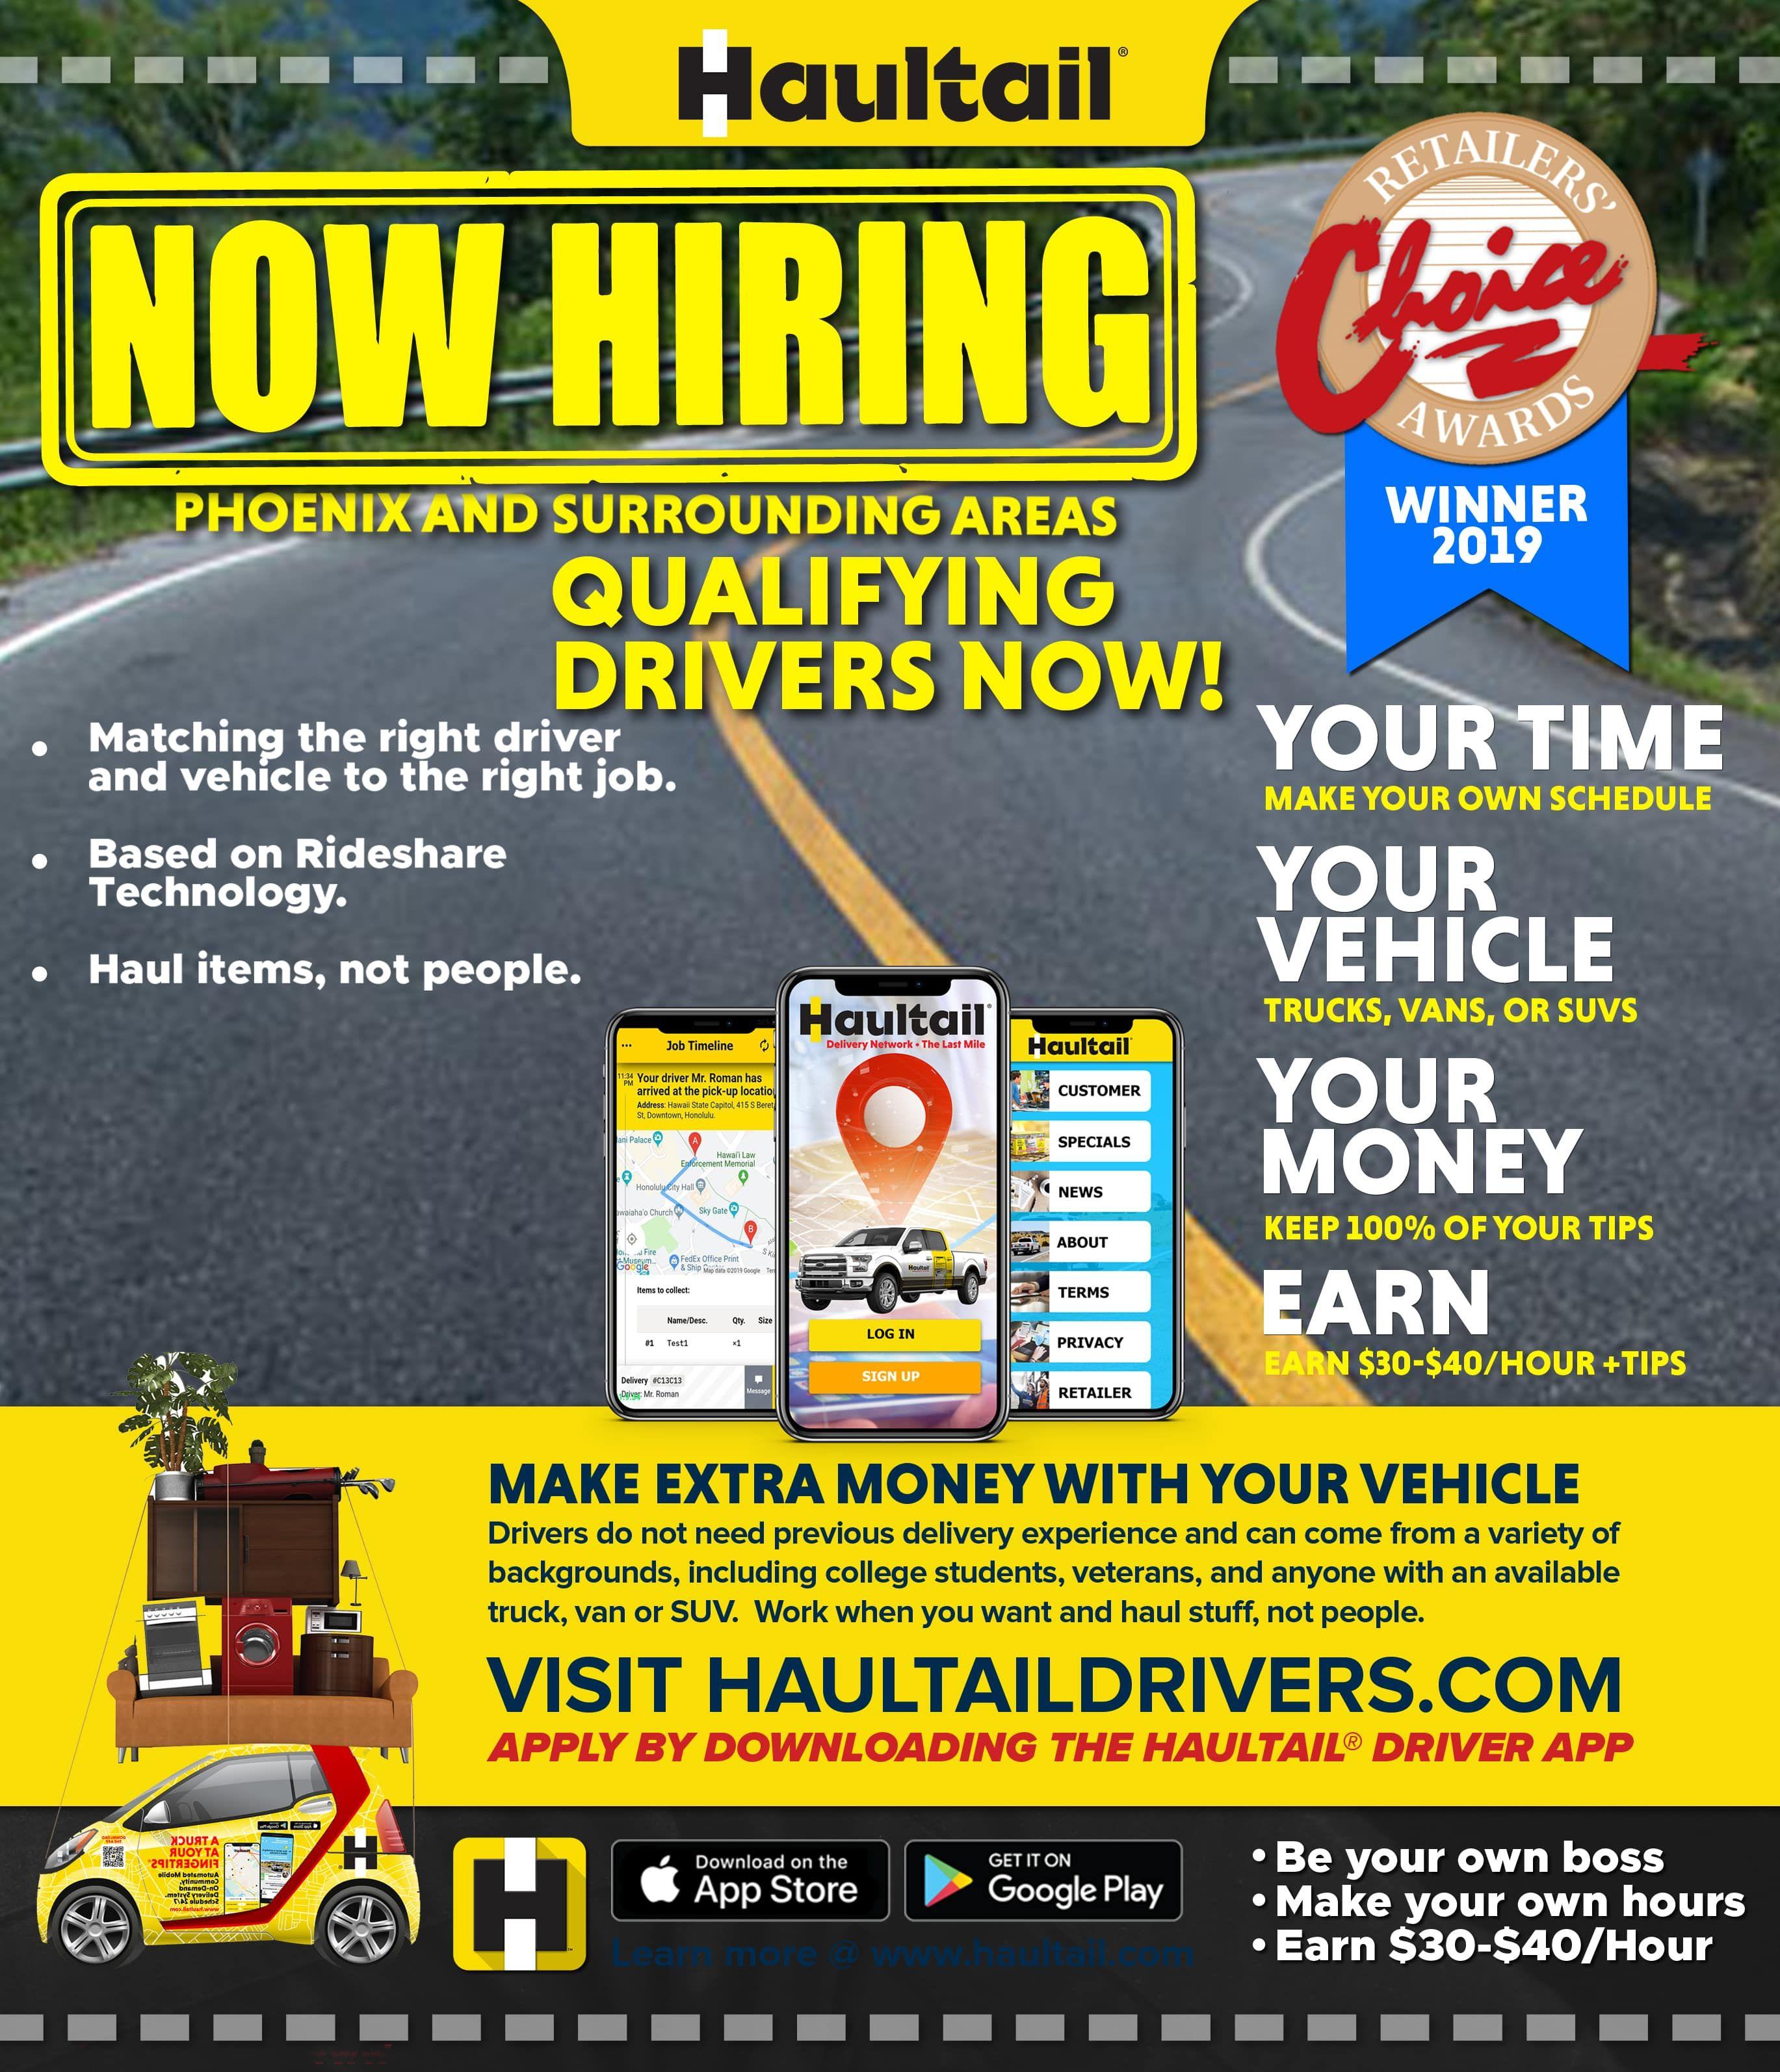 Craigslist Tucson Jobs Hiring - CREGLIS